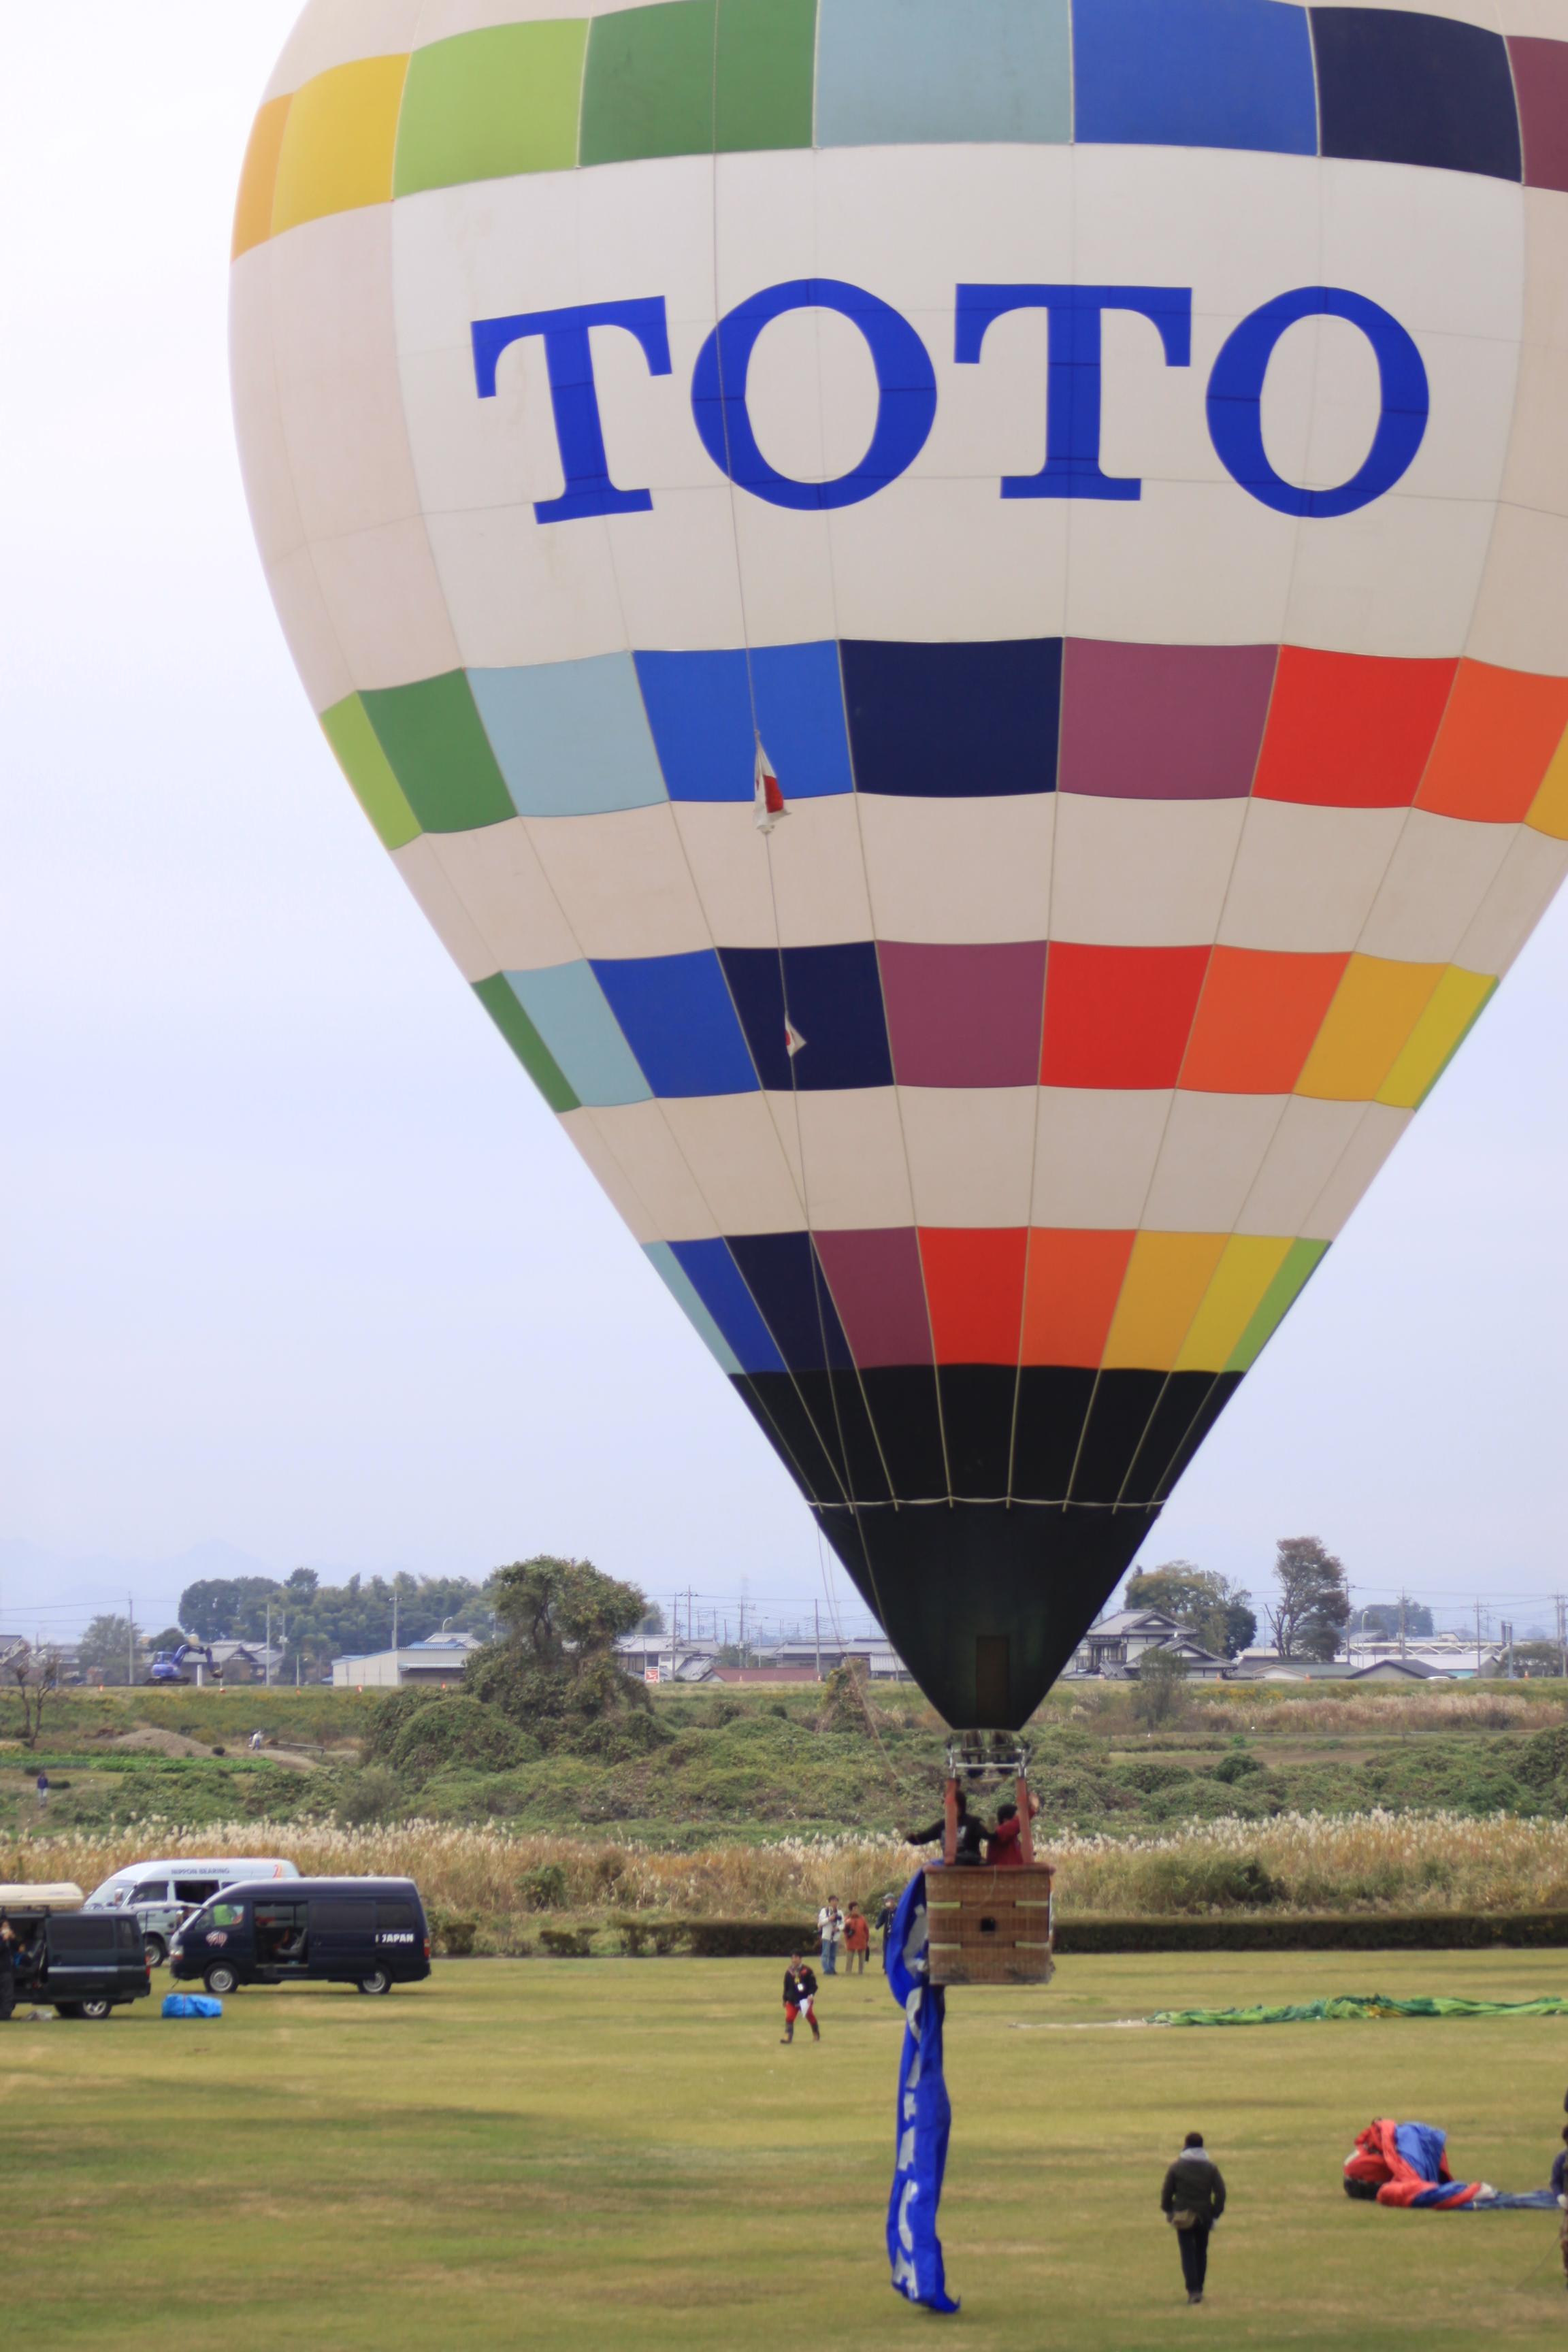 File:TOTO気球 (10778738016).jpg - Wikimedia Commons